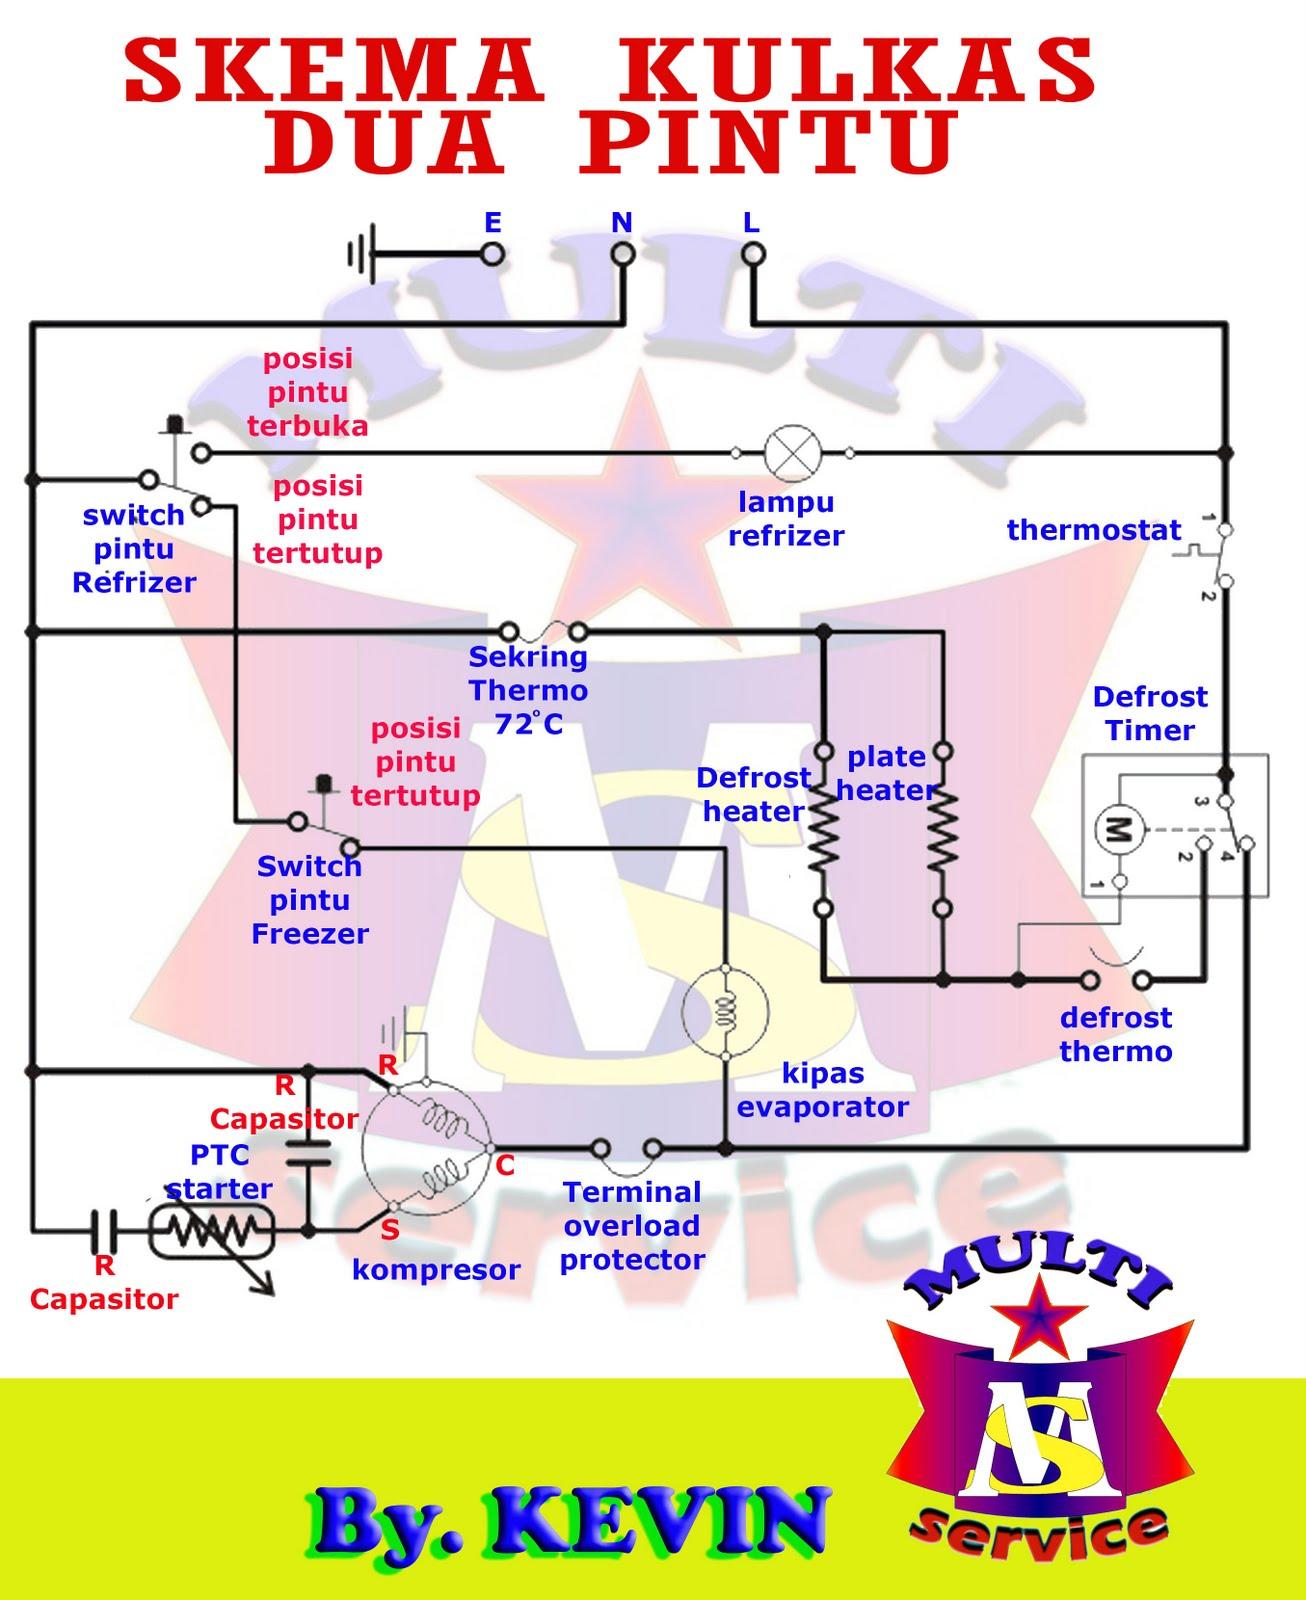 Wiring Diagram Kulkas 2 Pintu Lg : Kevinmulti diagram kulkas dua pintu